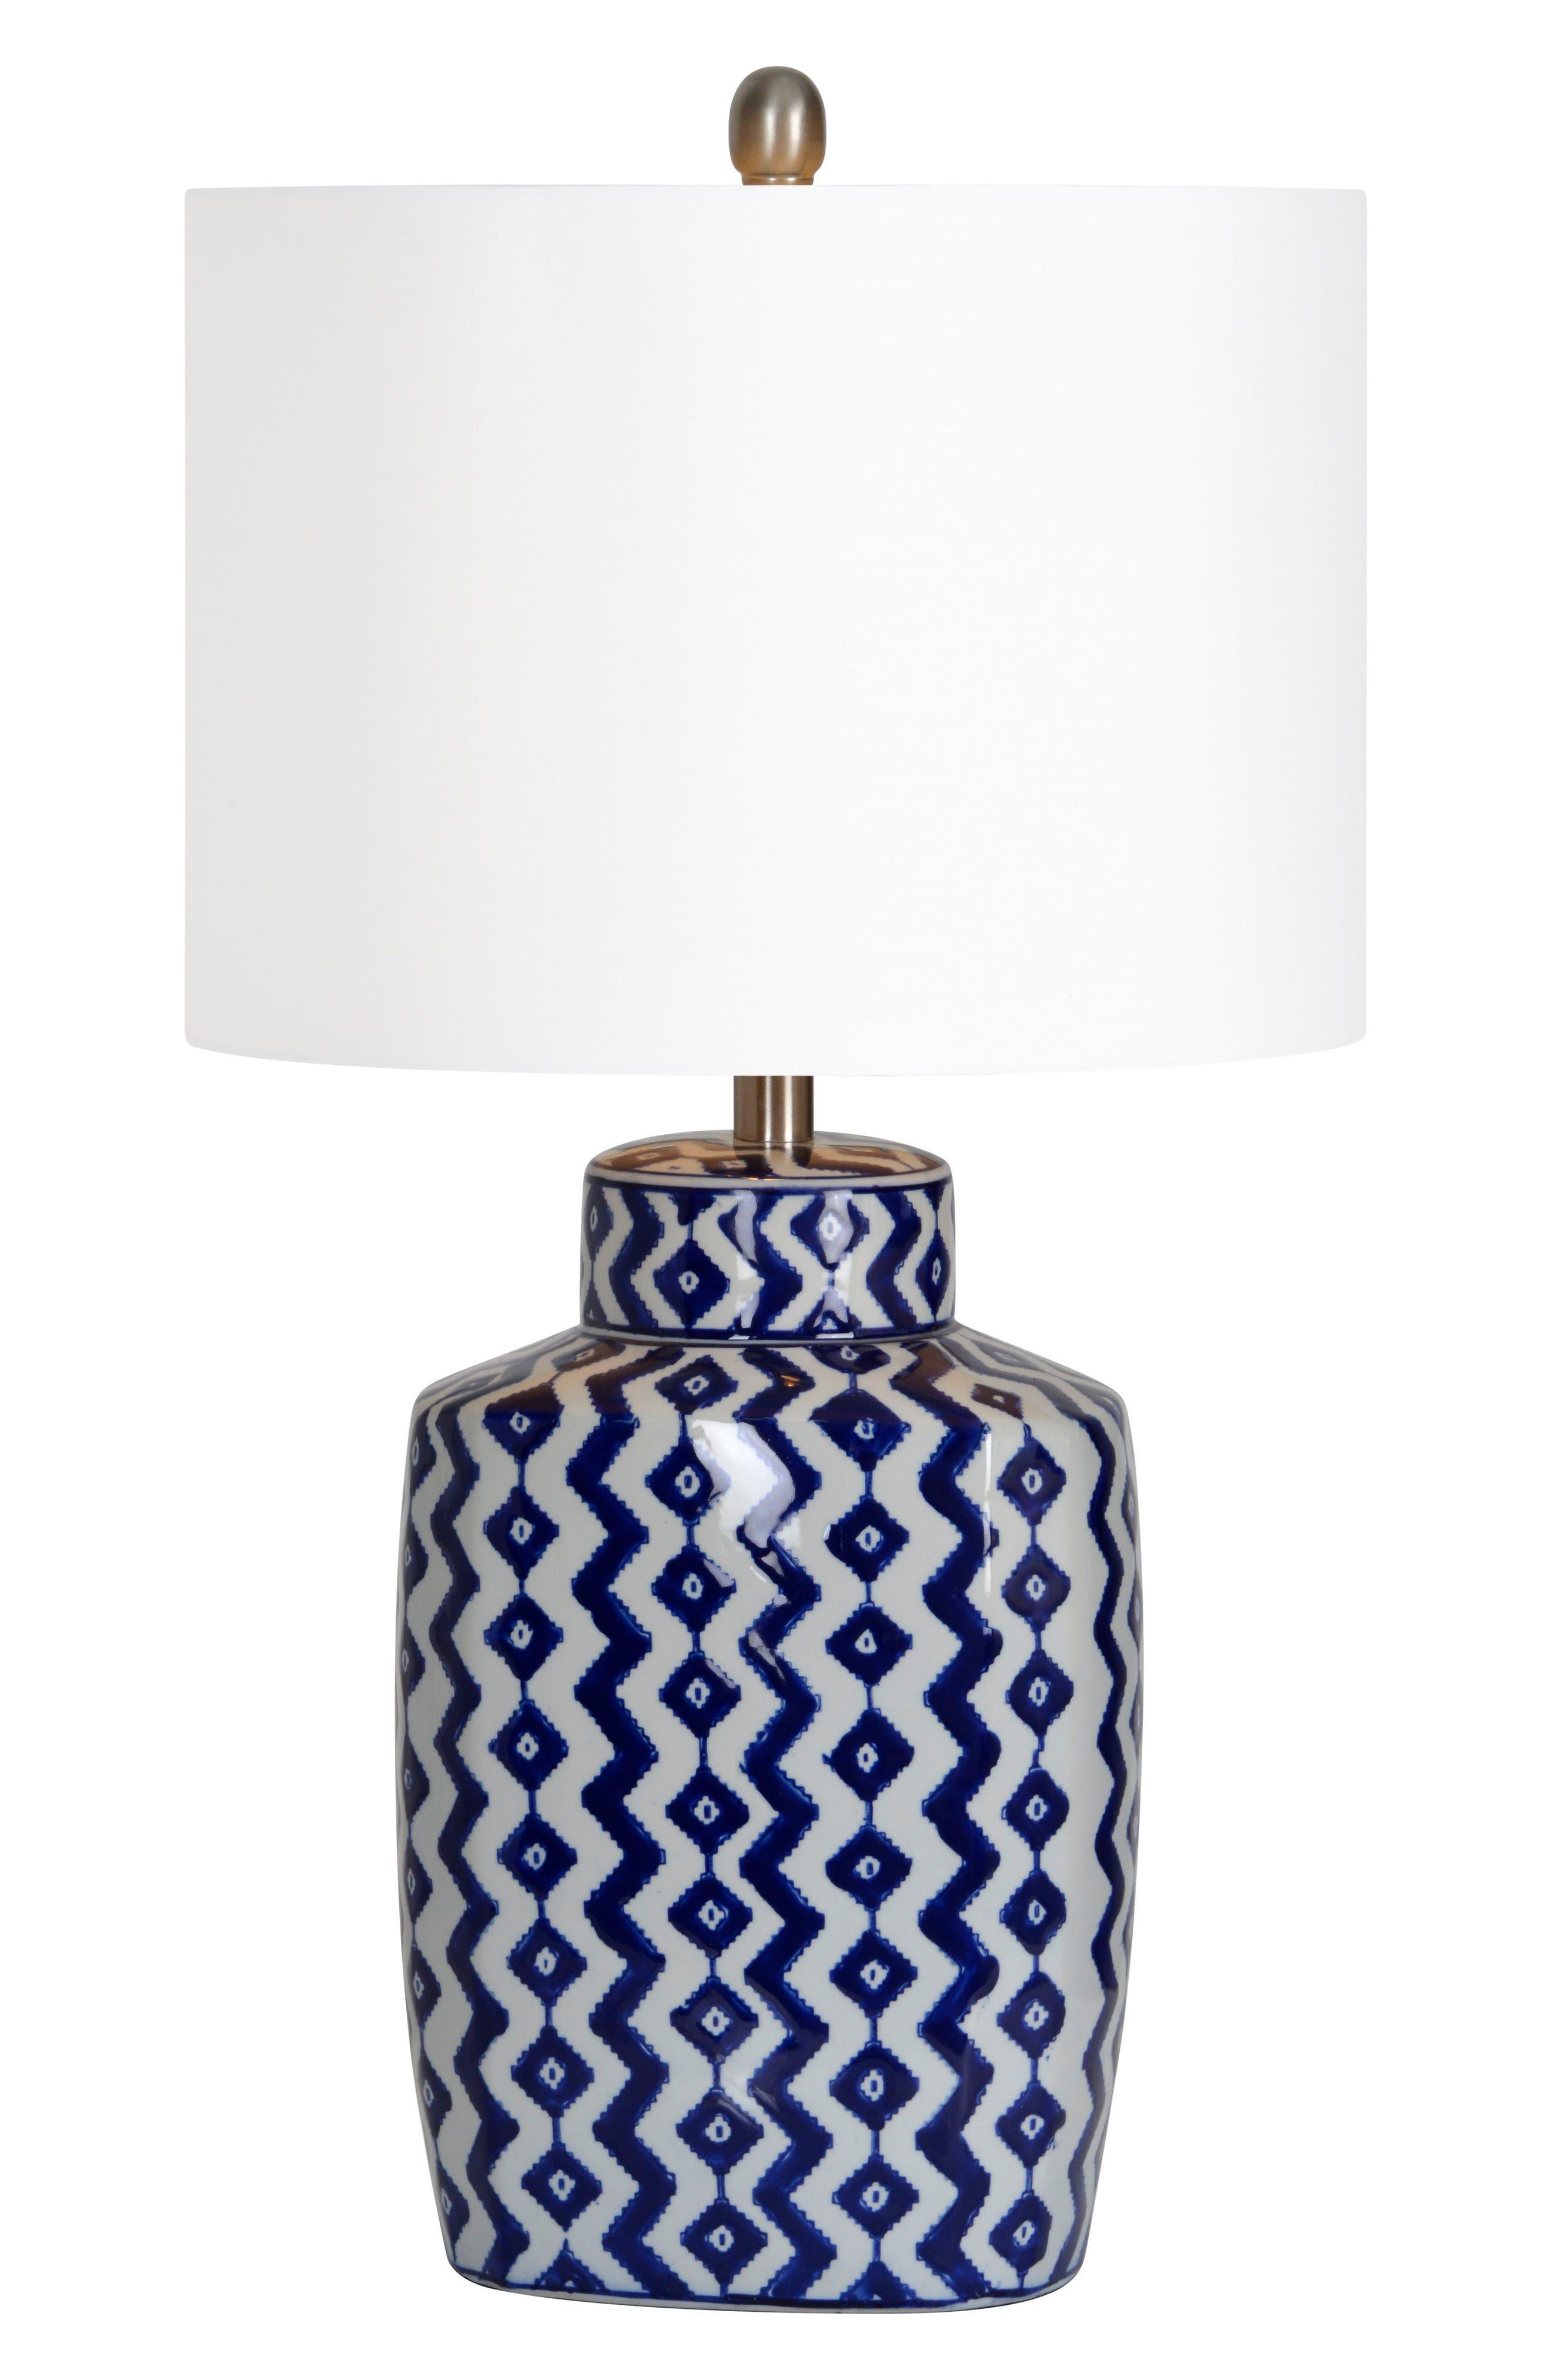 Beryl Table Lamp,                             Main thumbnail 1, color,                             BLUE/ WHITE CHEVRON/ NICKEL